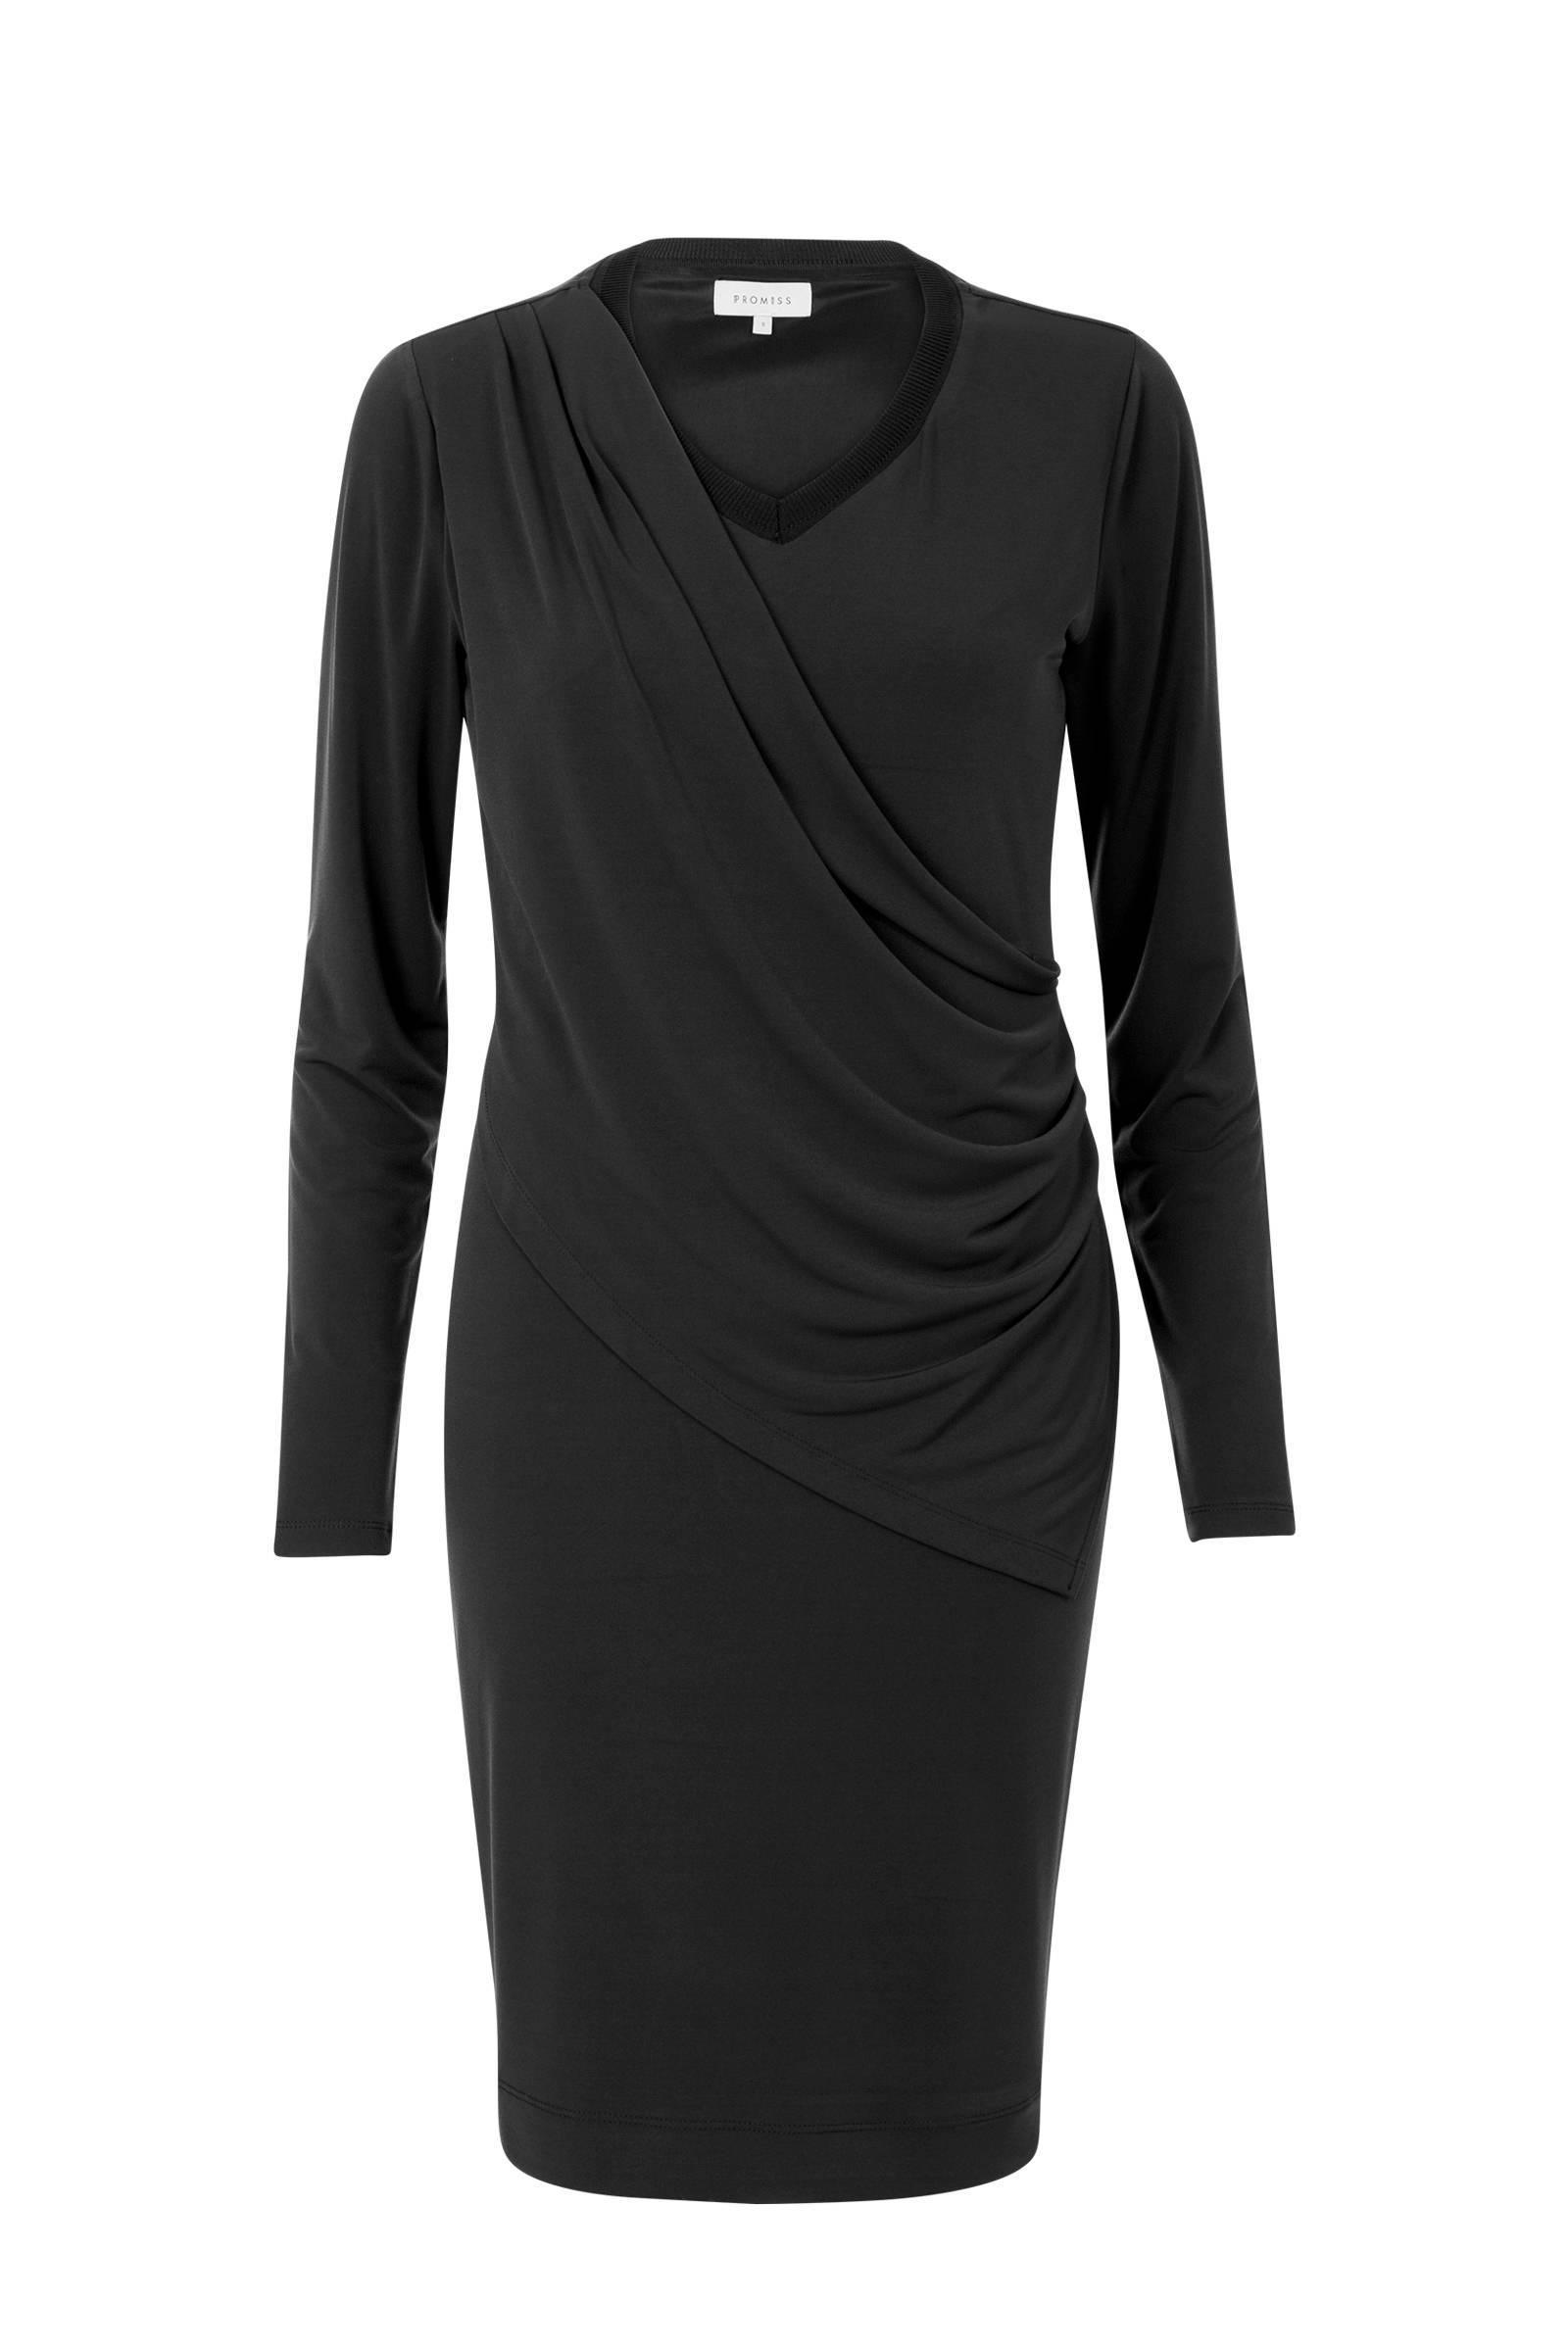 feestelijke jurk zwart